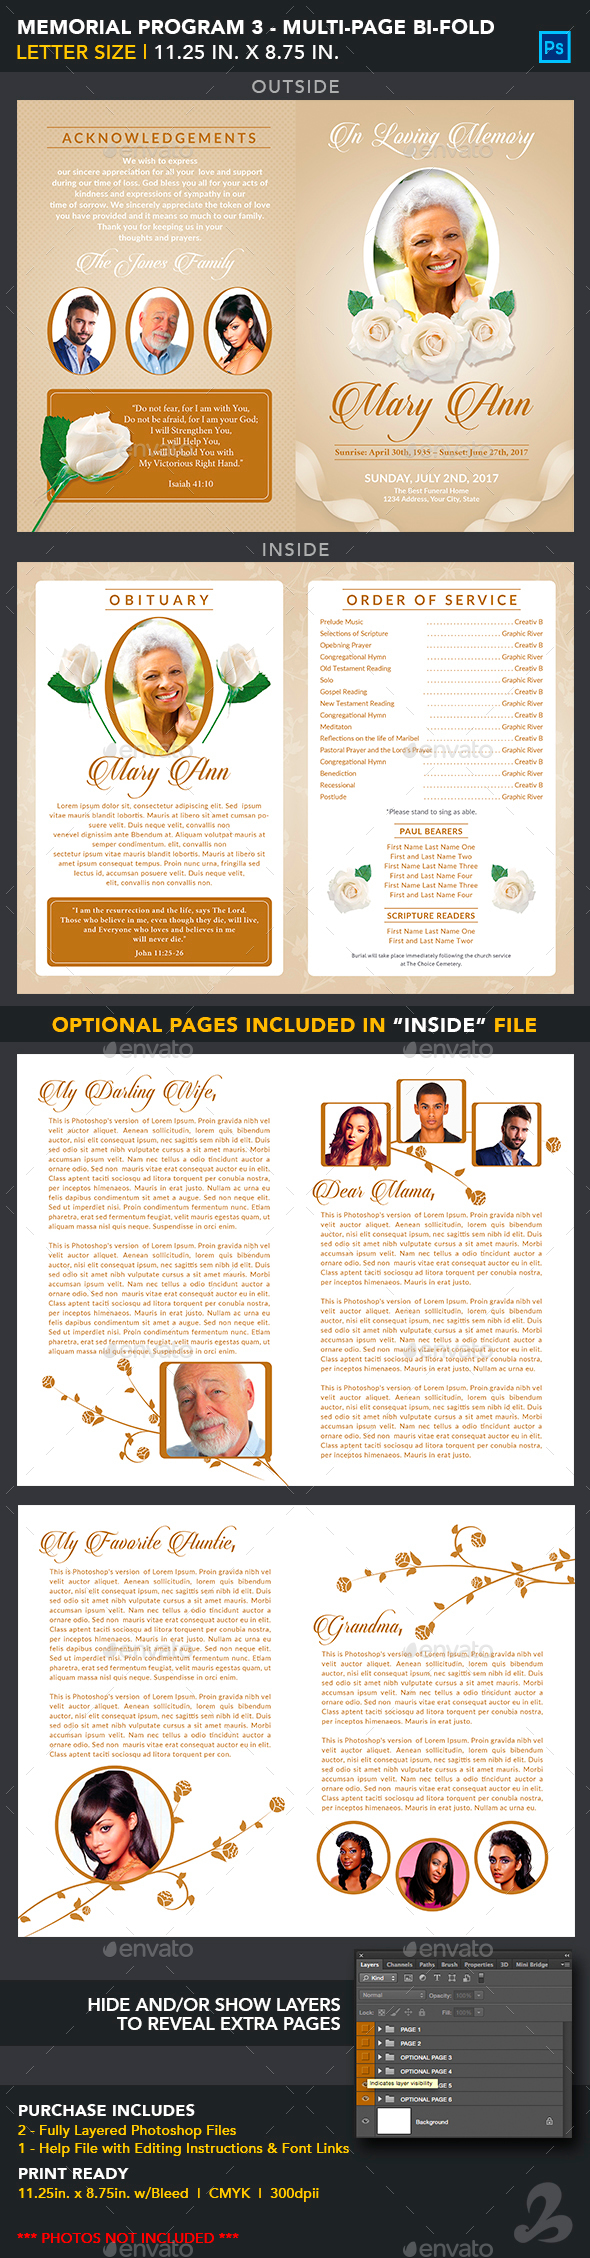 Memorial Program Template 3 - Multipage Bi-Fold - Informational Brochures